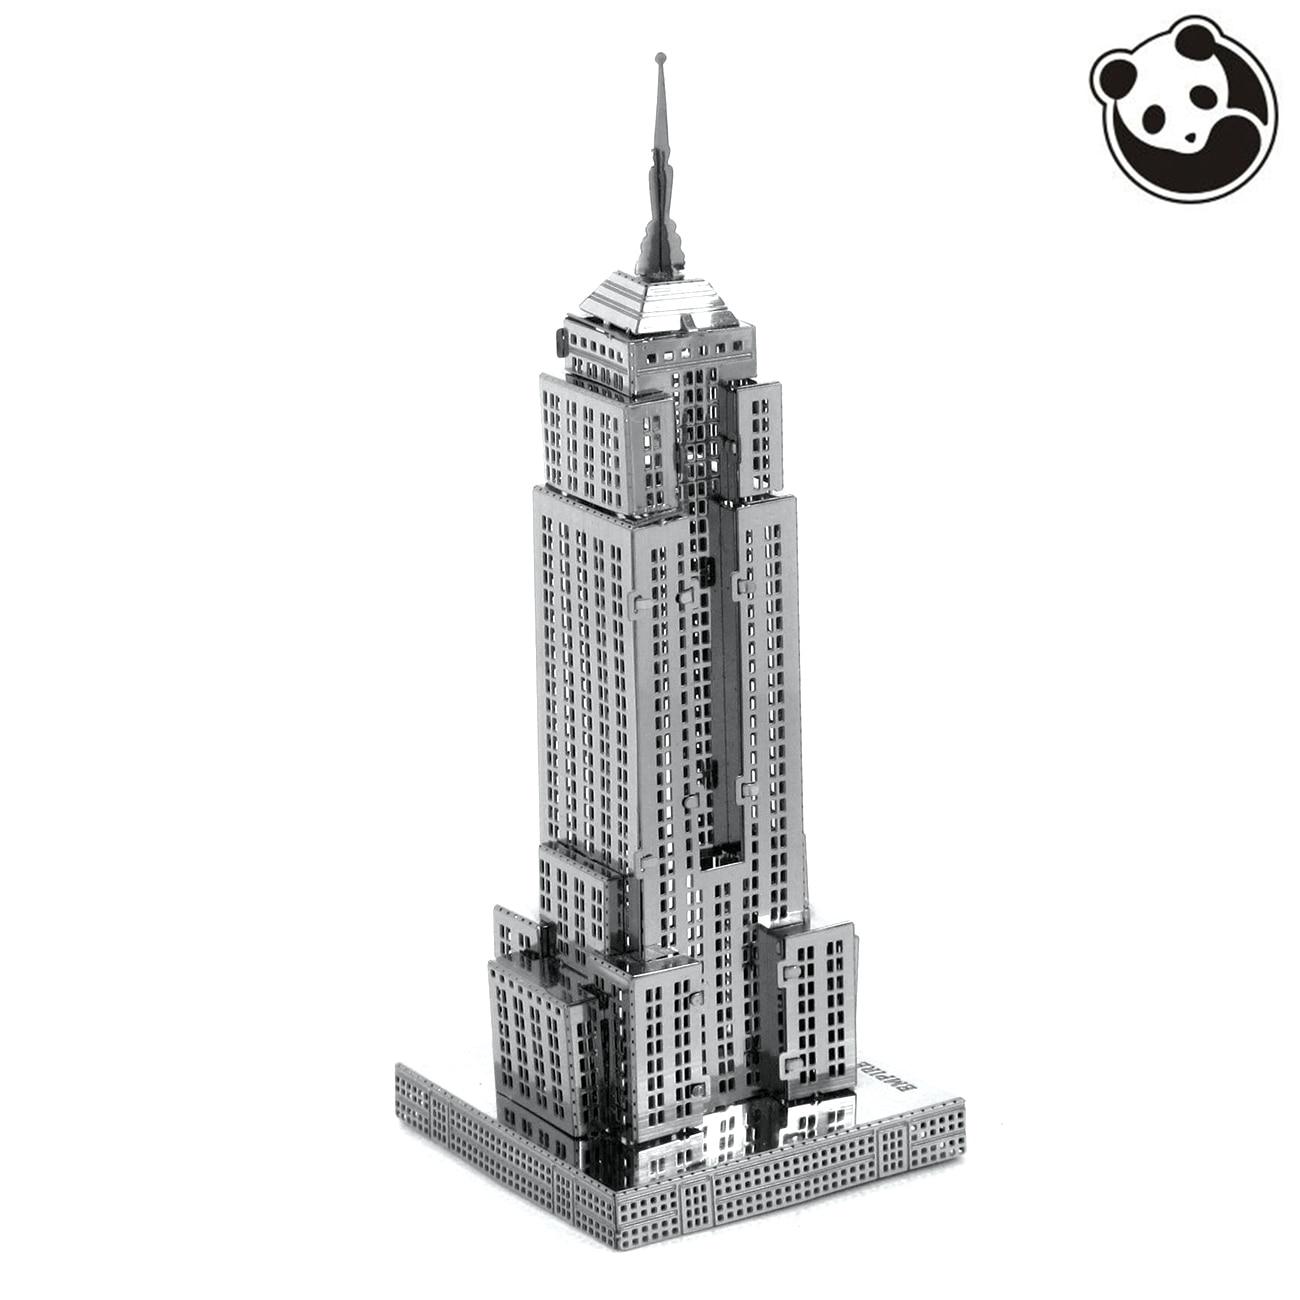 Pandamodel @ Bau Berühmte gebäude über die welt 3D Metall modell Puzzles...